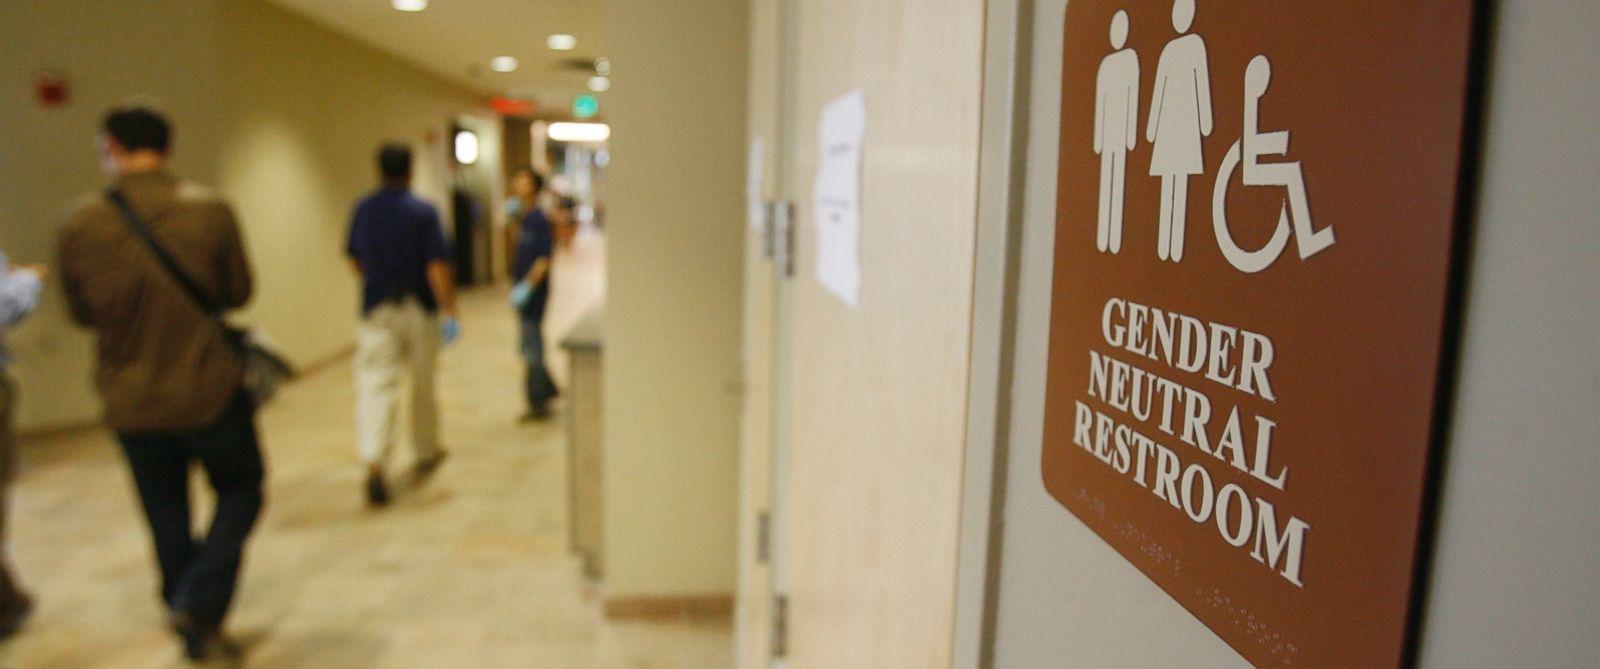 white house makes 1st gender-neutral bathroom available - abc news